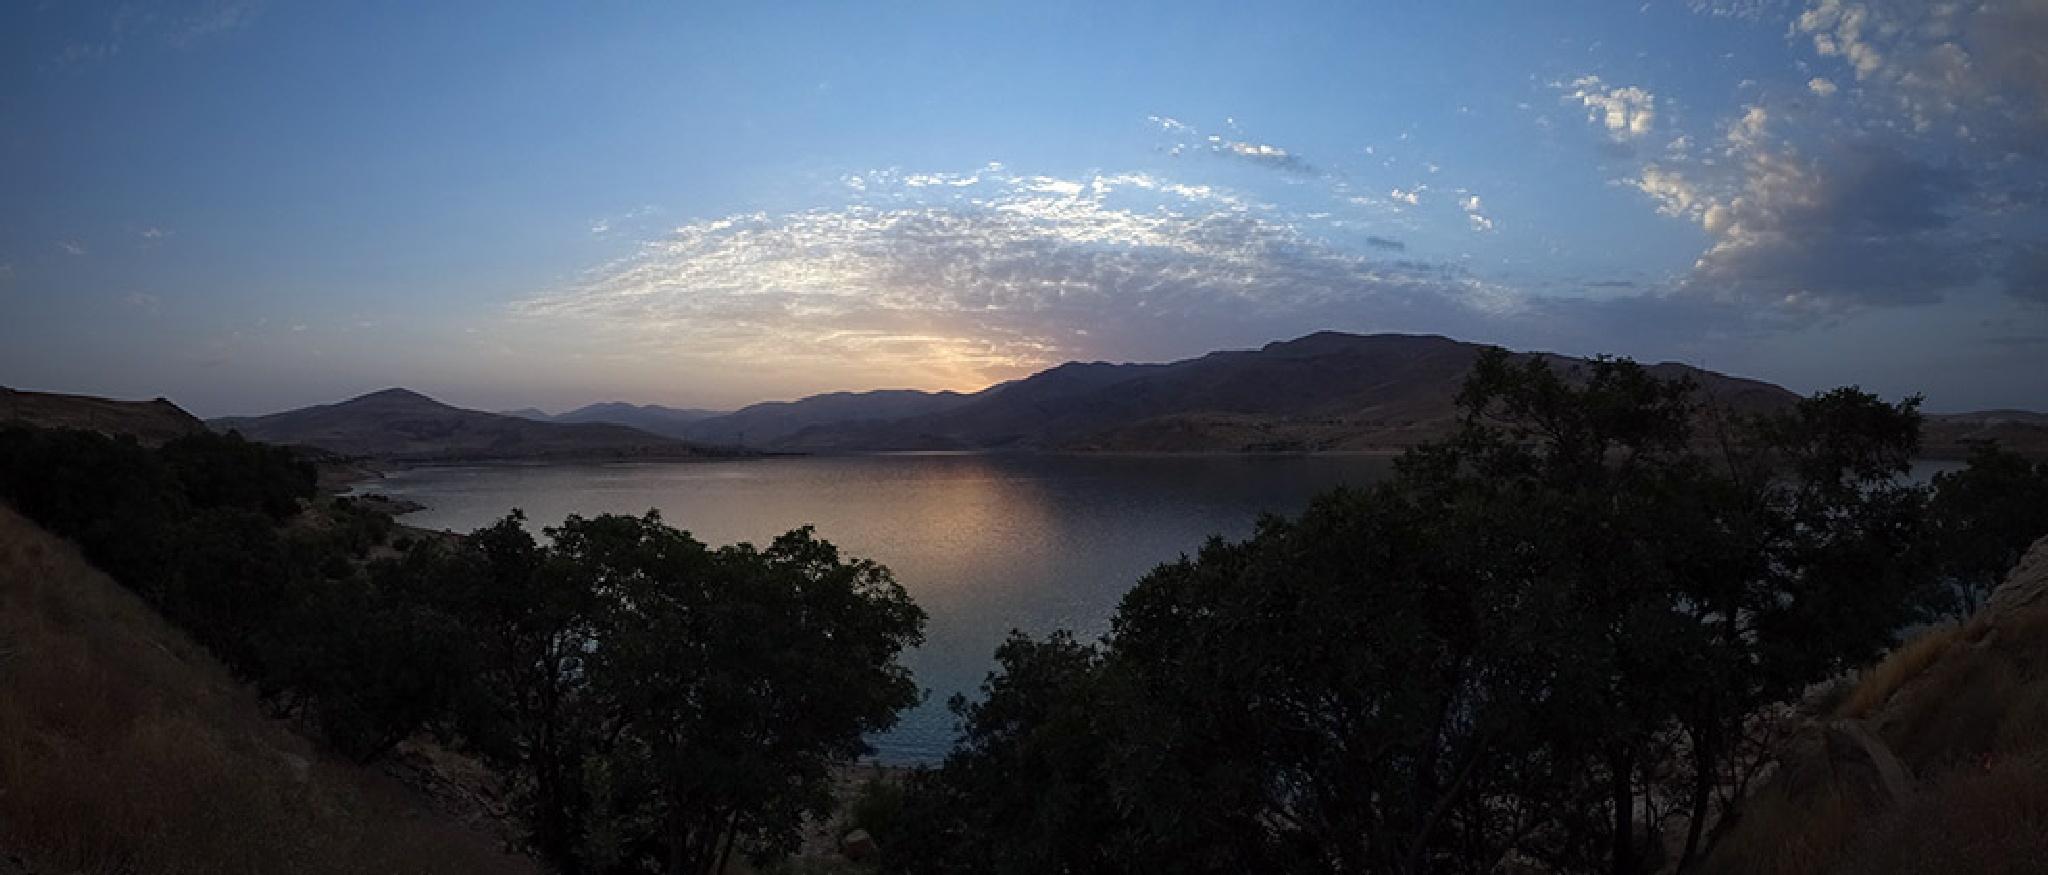 Mahabad Lake Panorama by Jamal -Kurdistan